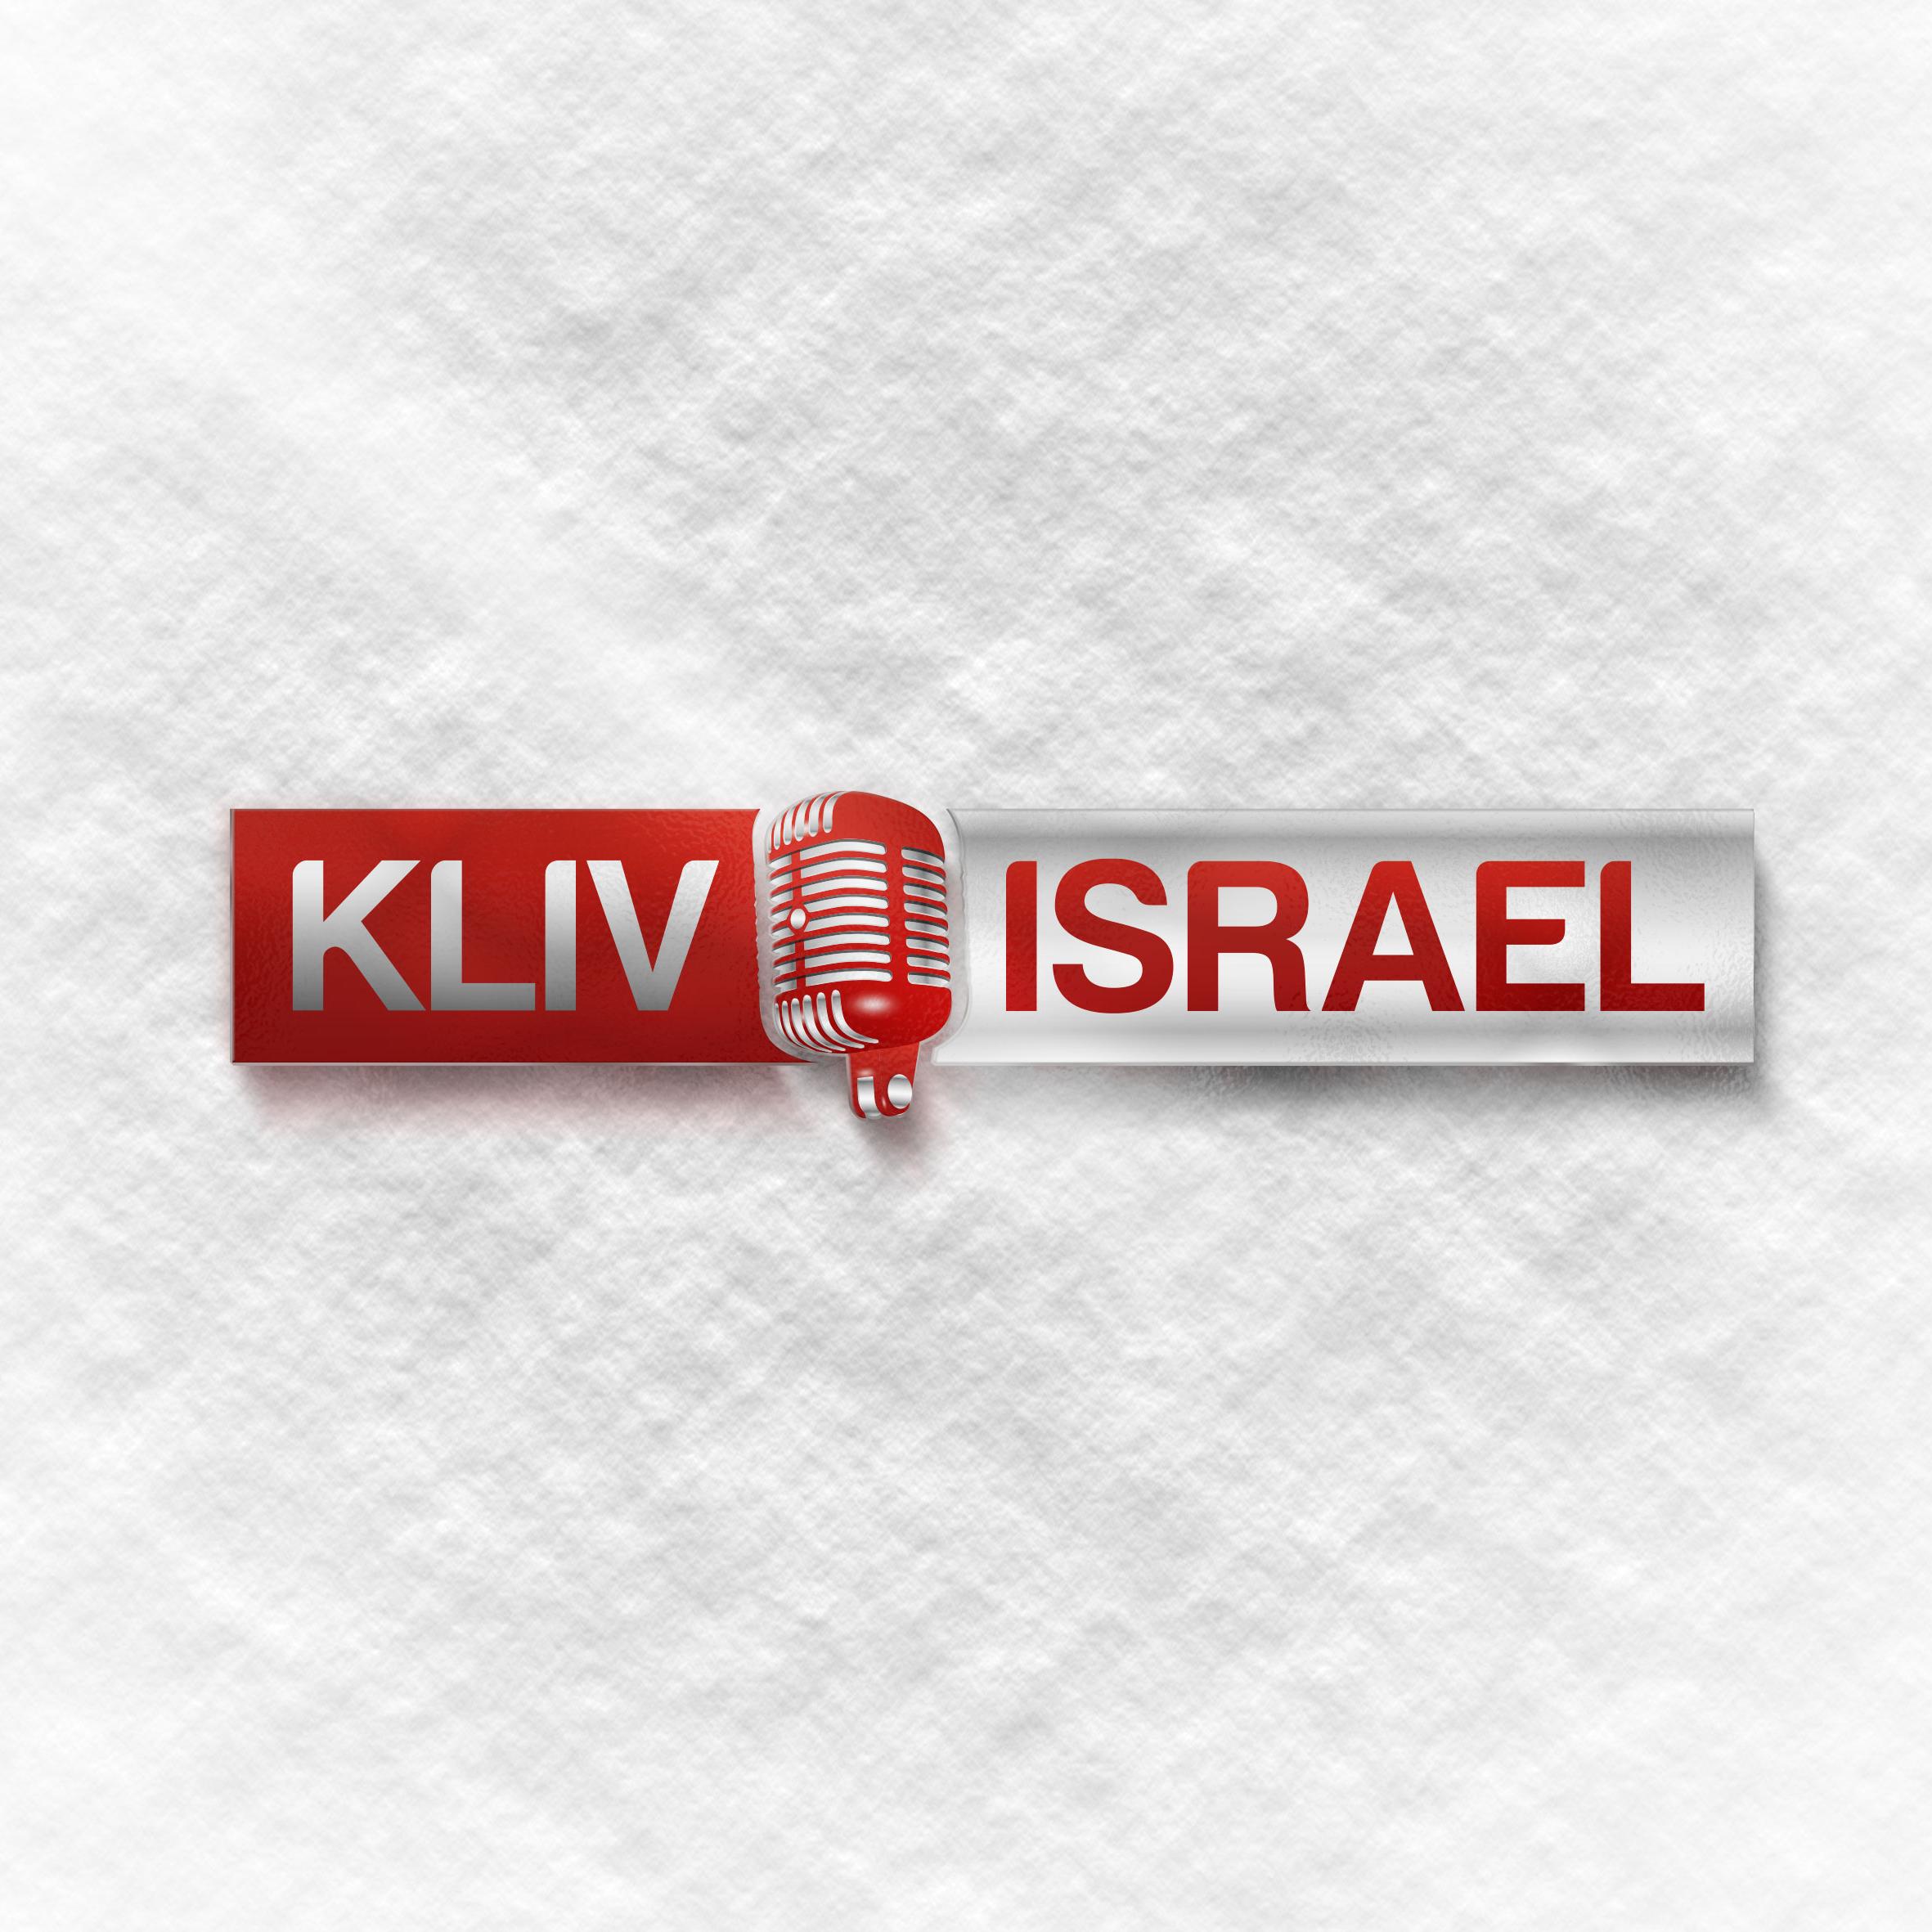 KLIV Israel